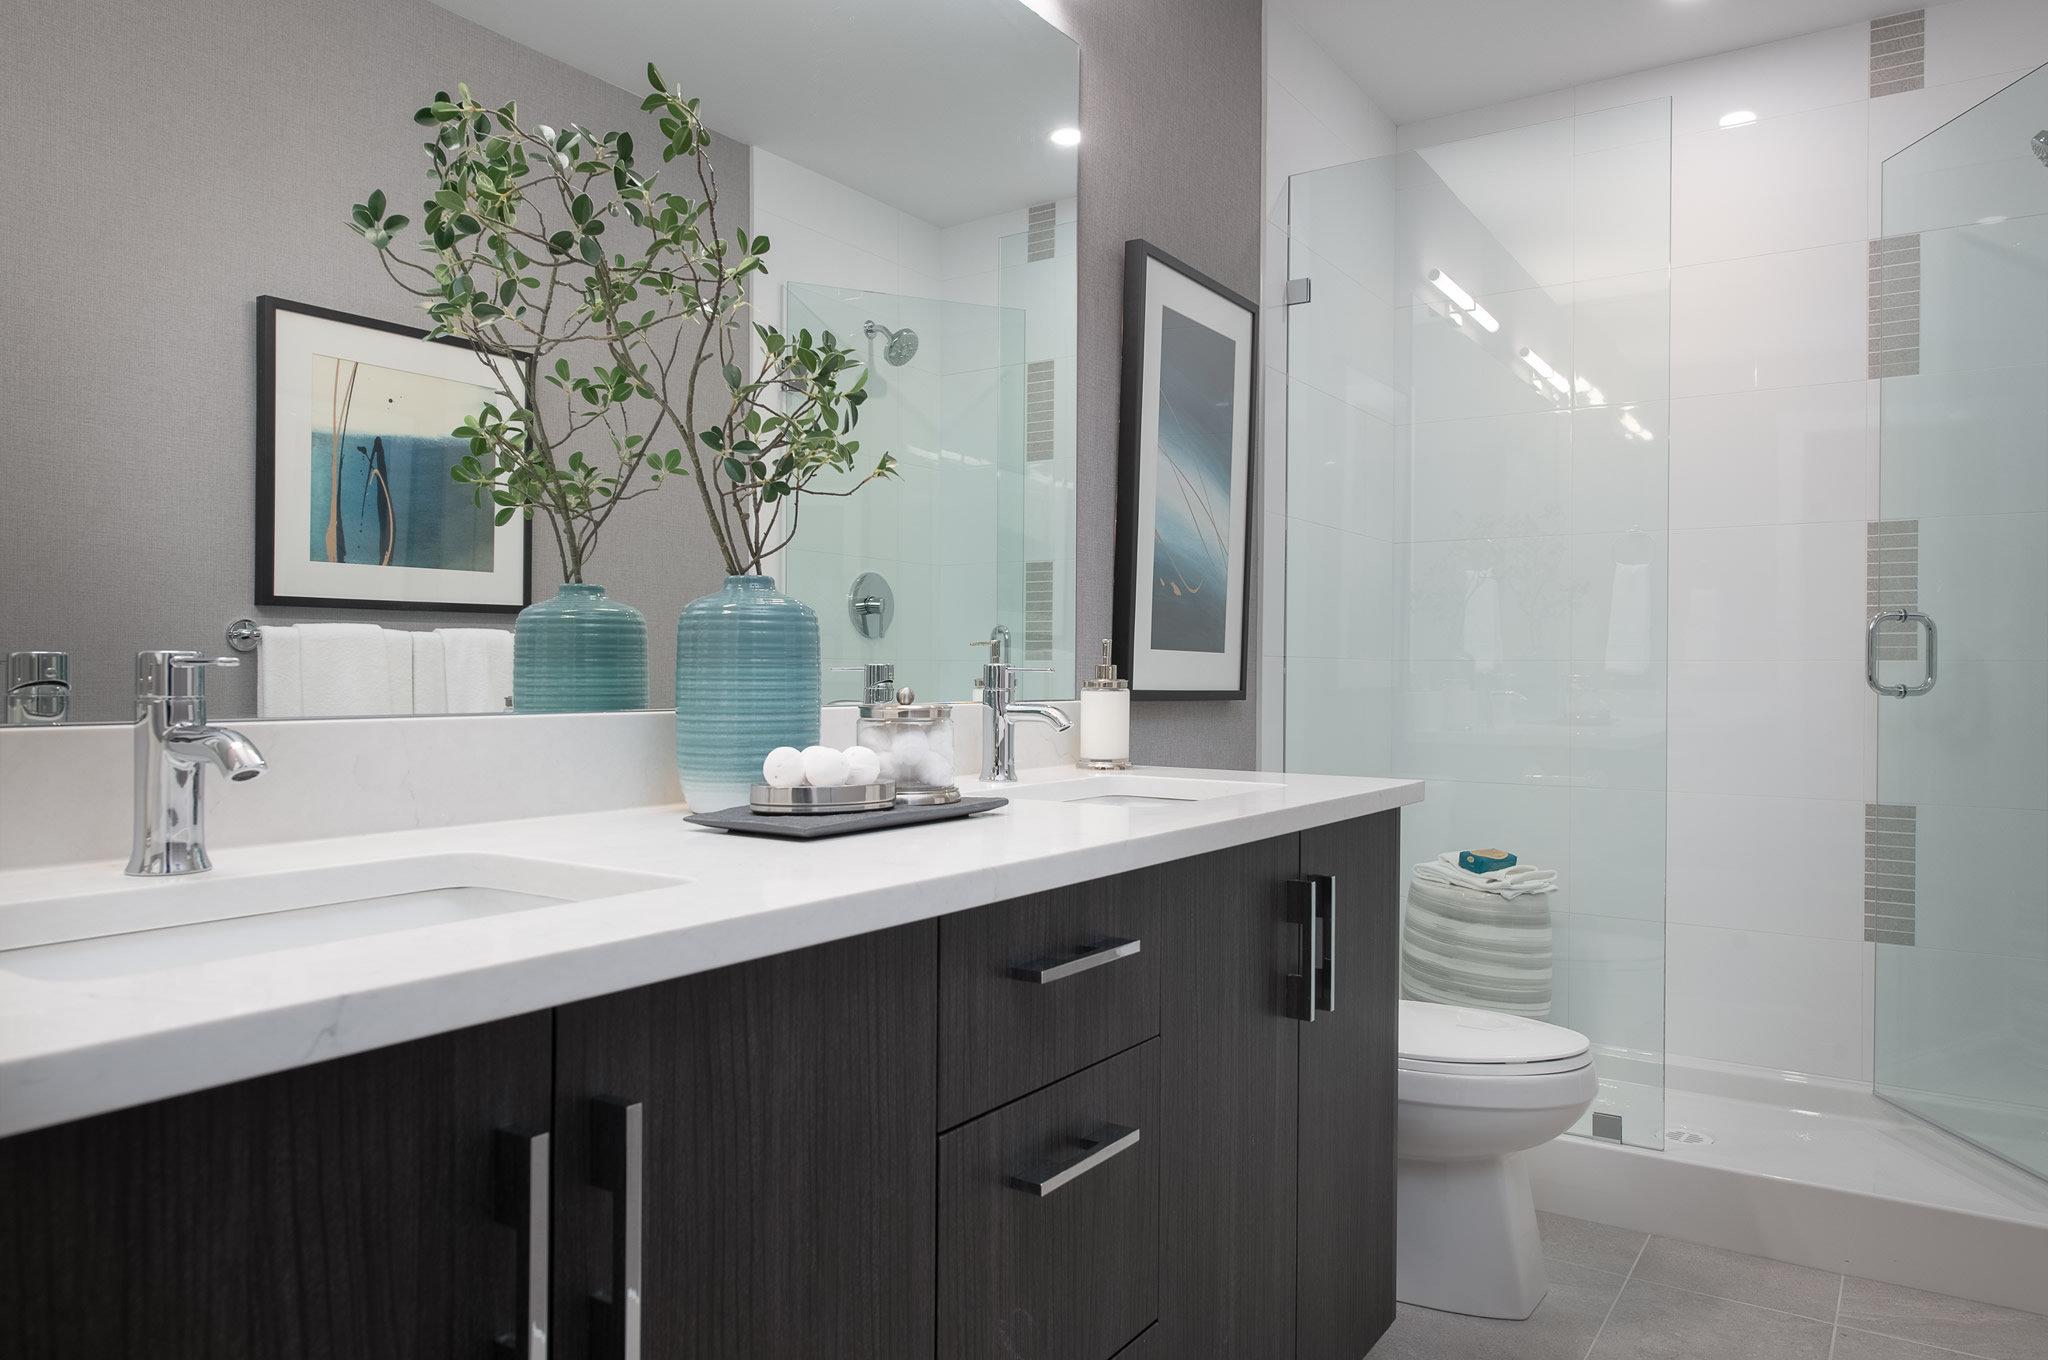 Bathroom - 32838 Ventura Ave, Abbotsford, BC V2S 6J3, Canada!